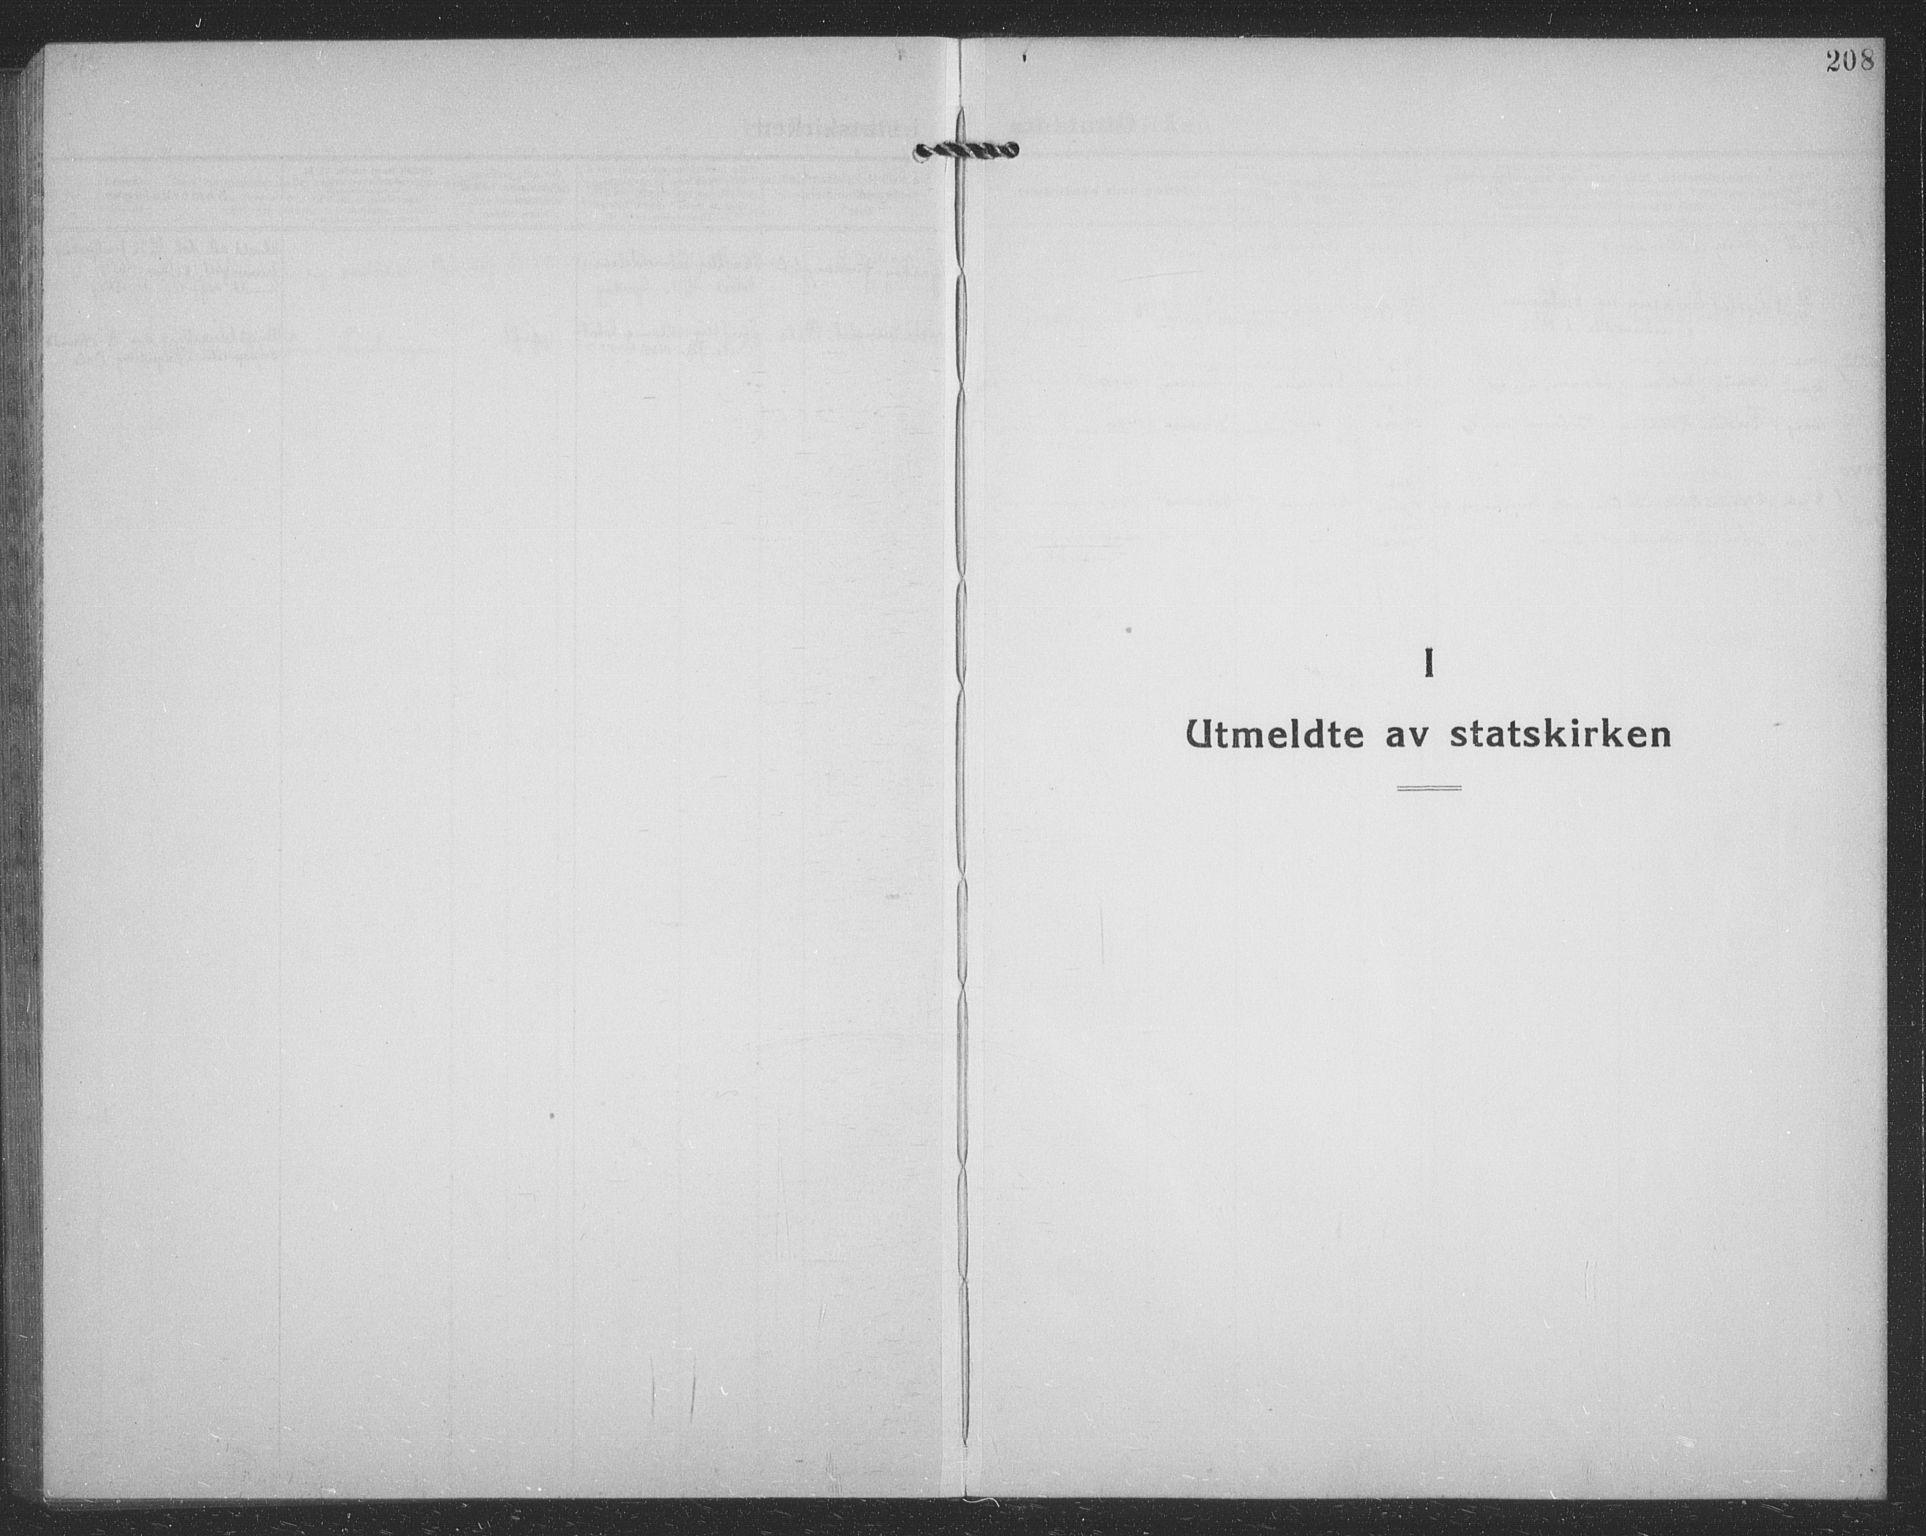 SATØ, Tranøy sokneprestkontor, I/Ia/Iab/L0024klokker: Klokkerbok nr. 24, 1929-1943, s. 208